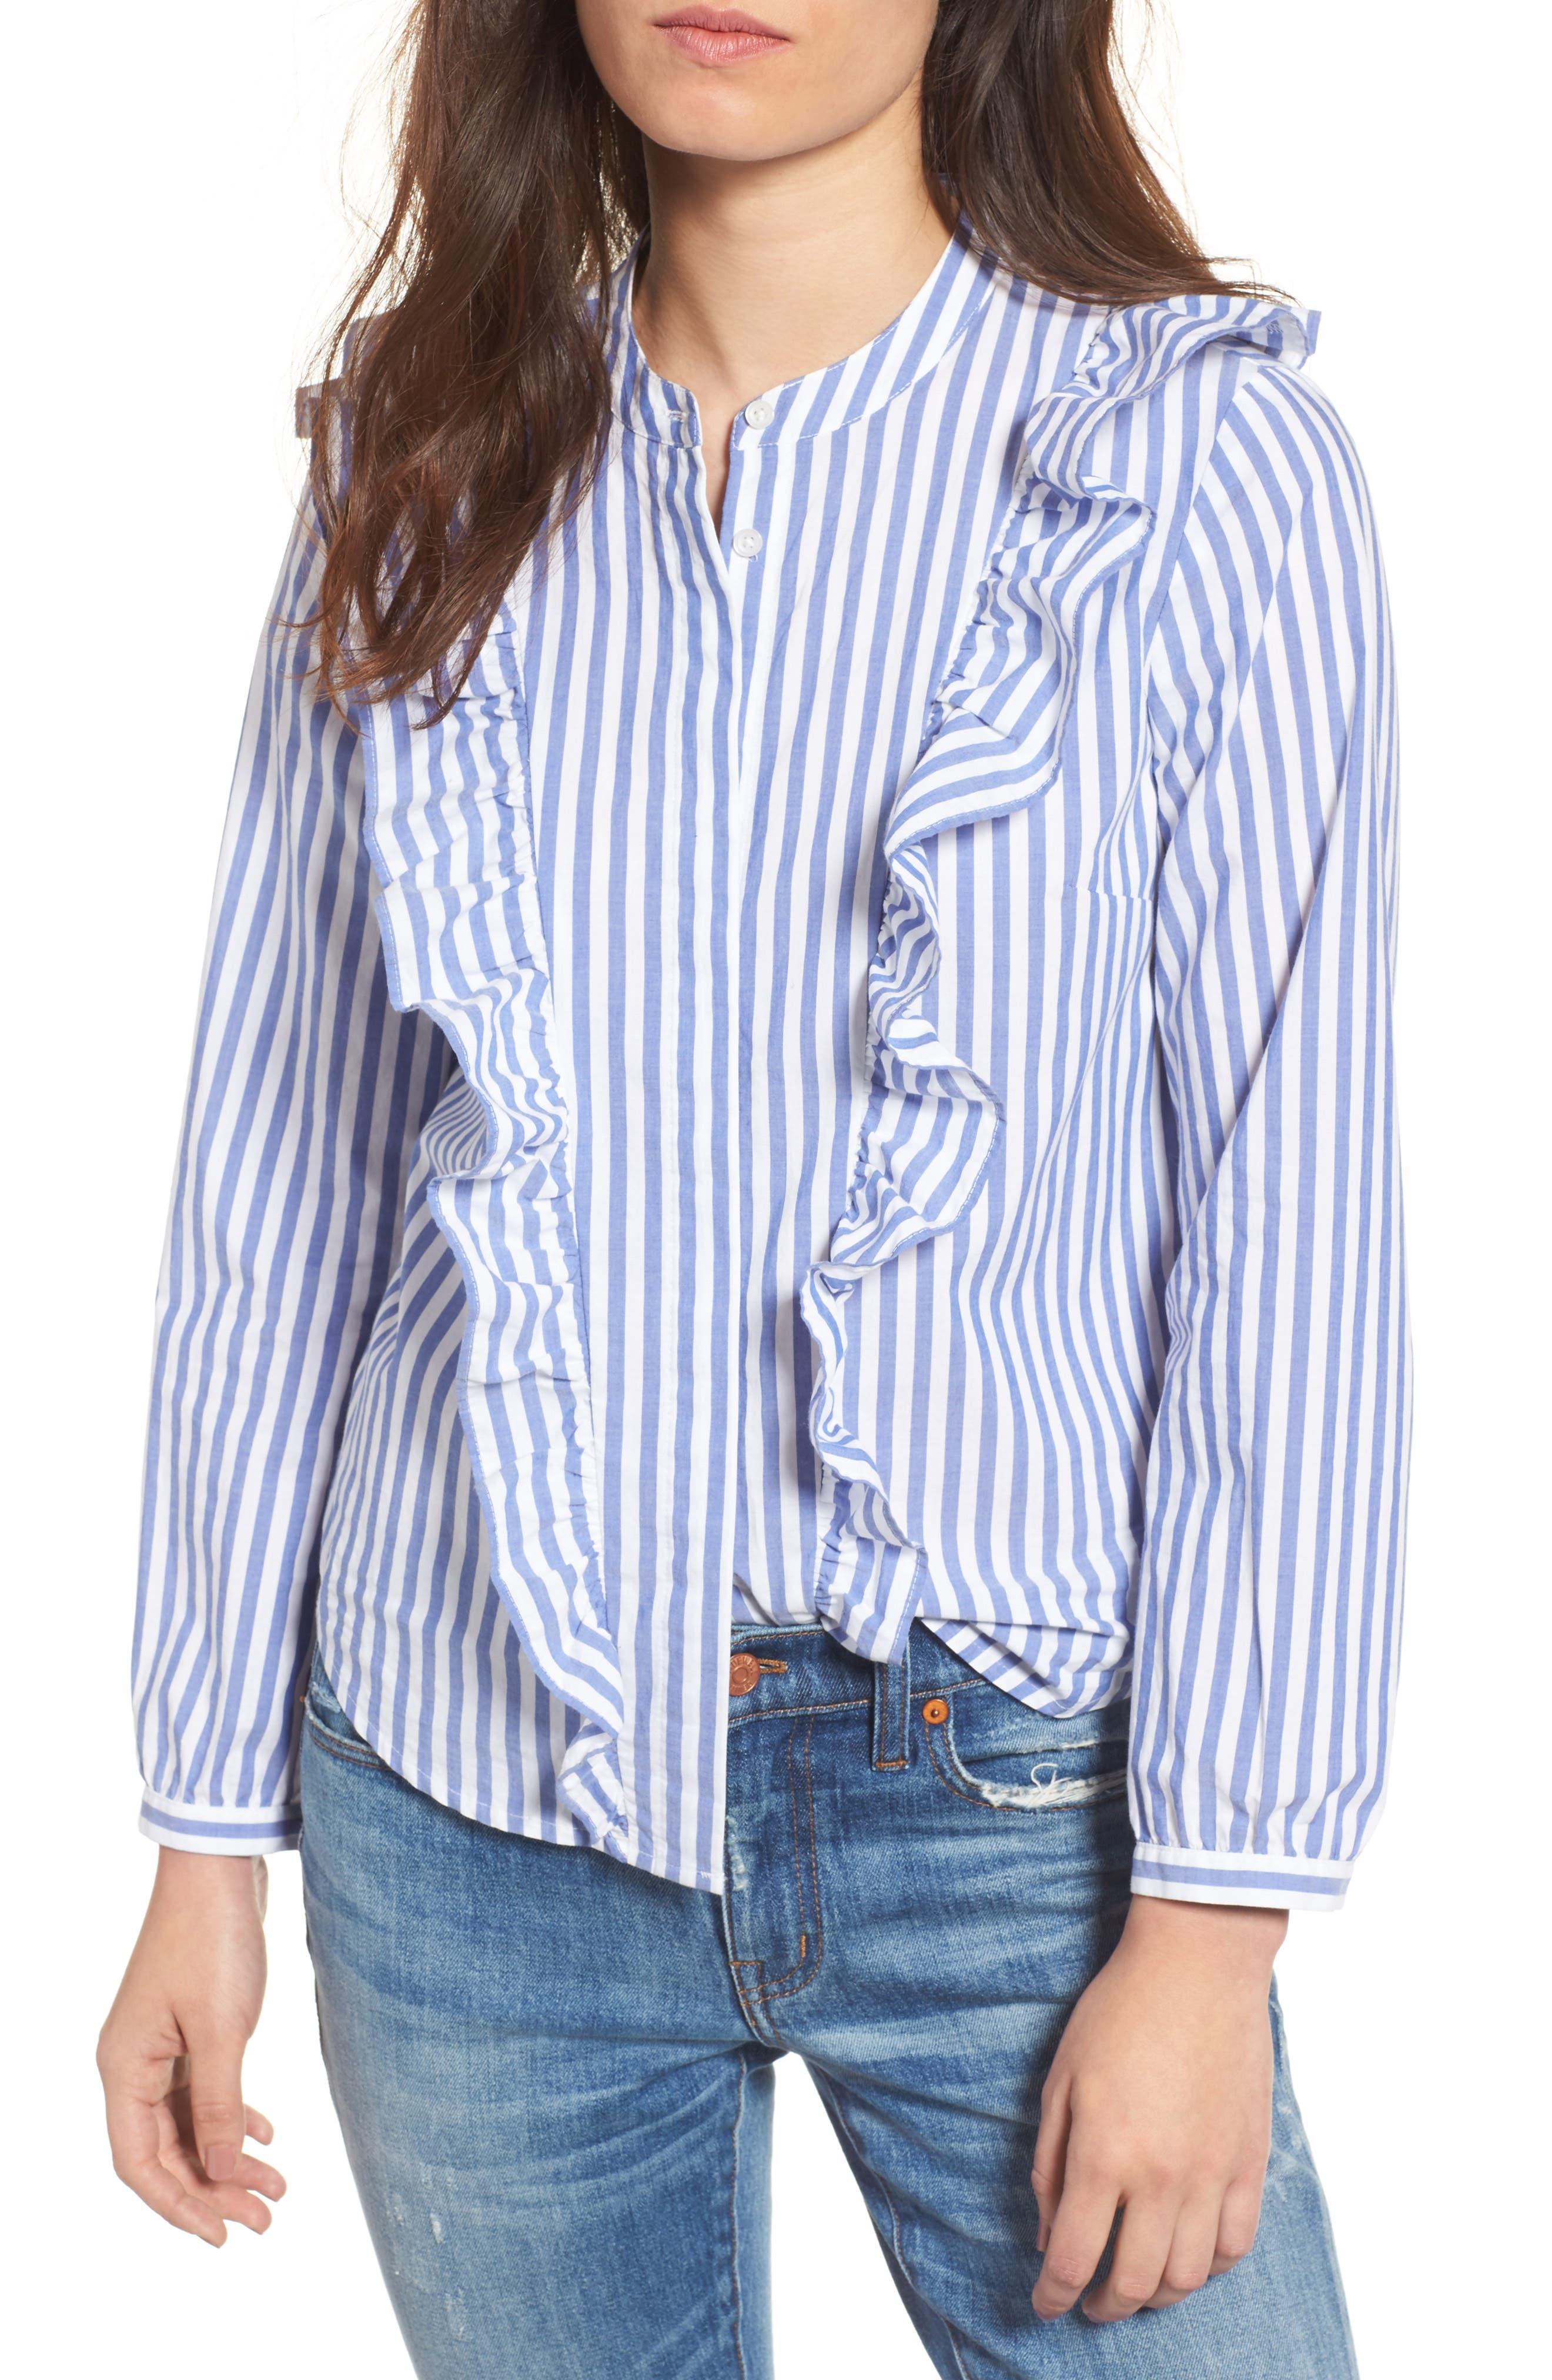 Madewell Whitney Stripe Ruffle Blouse